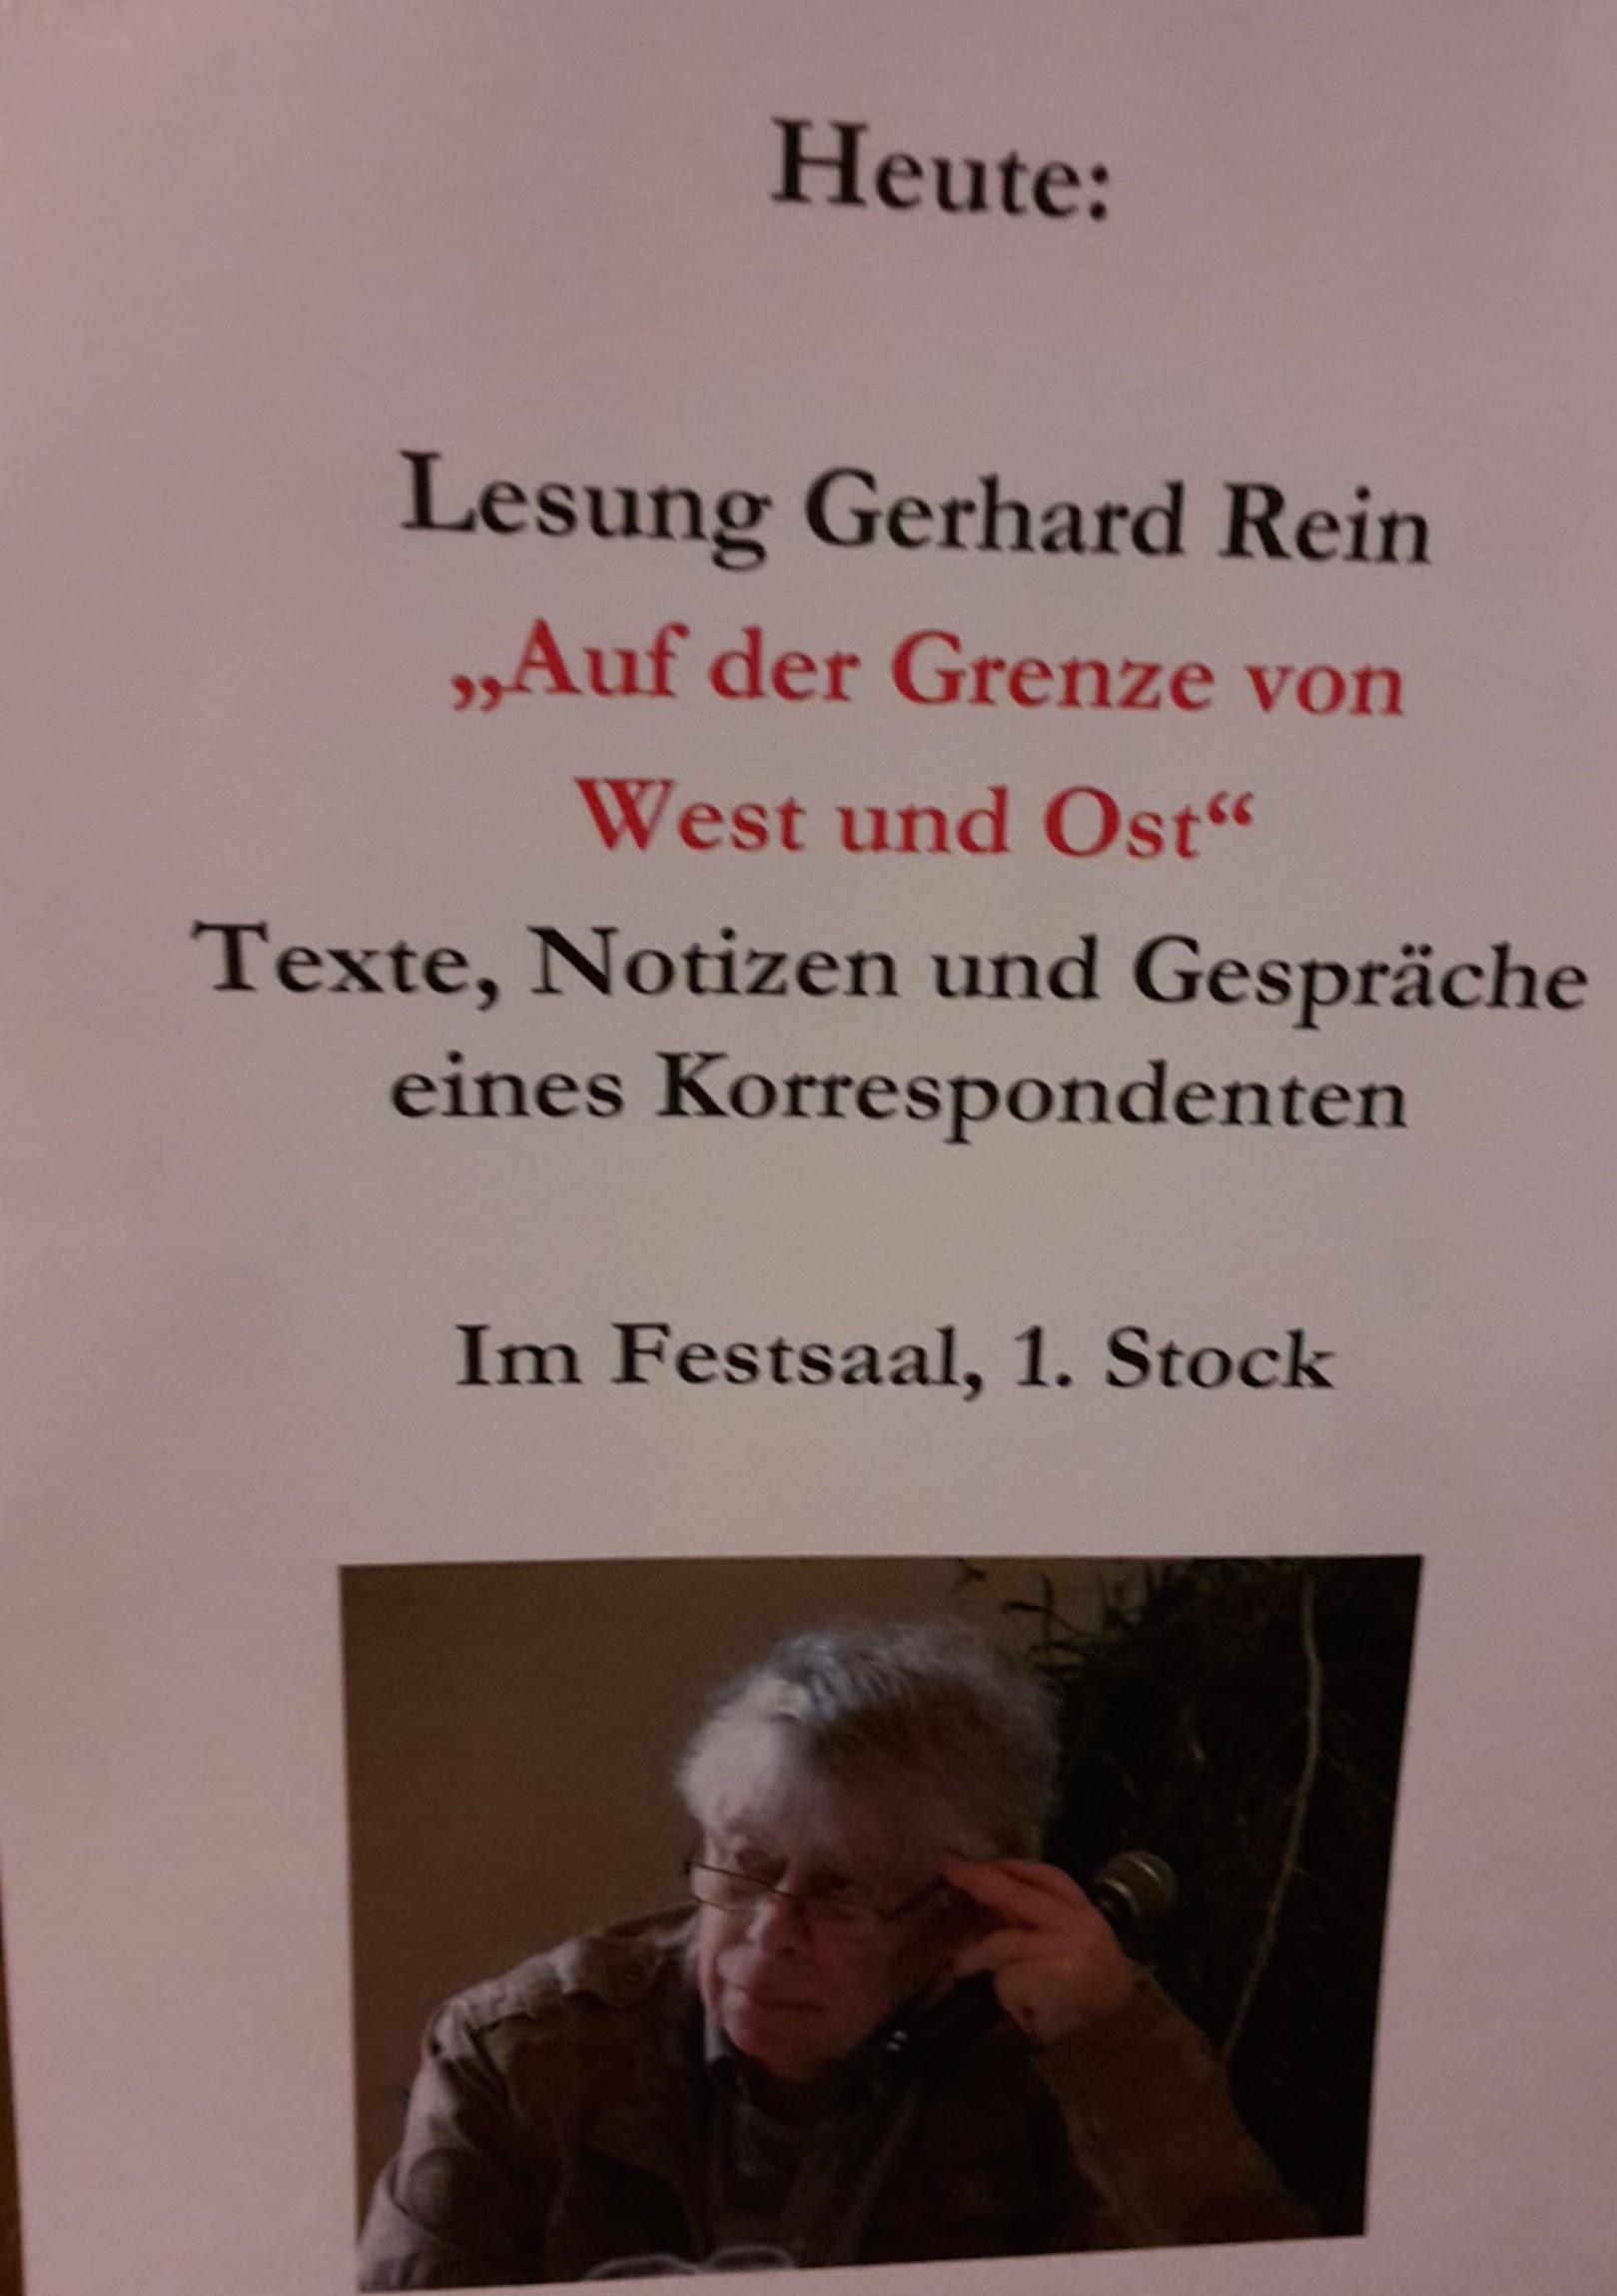 2017.10.09 001 Erfurter HerbstLESE Gerh. Rein